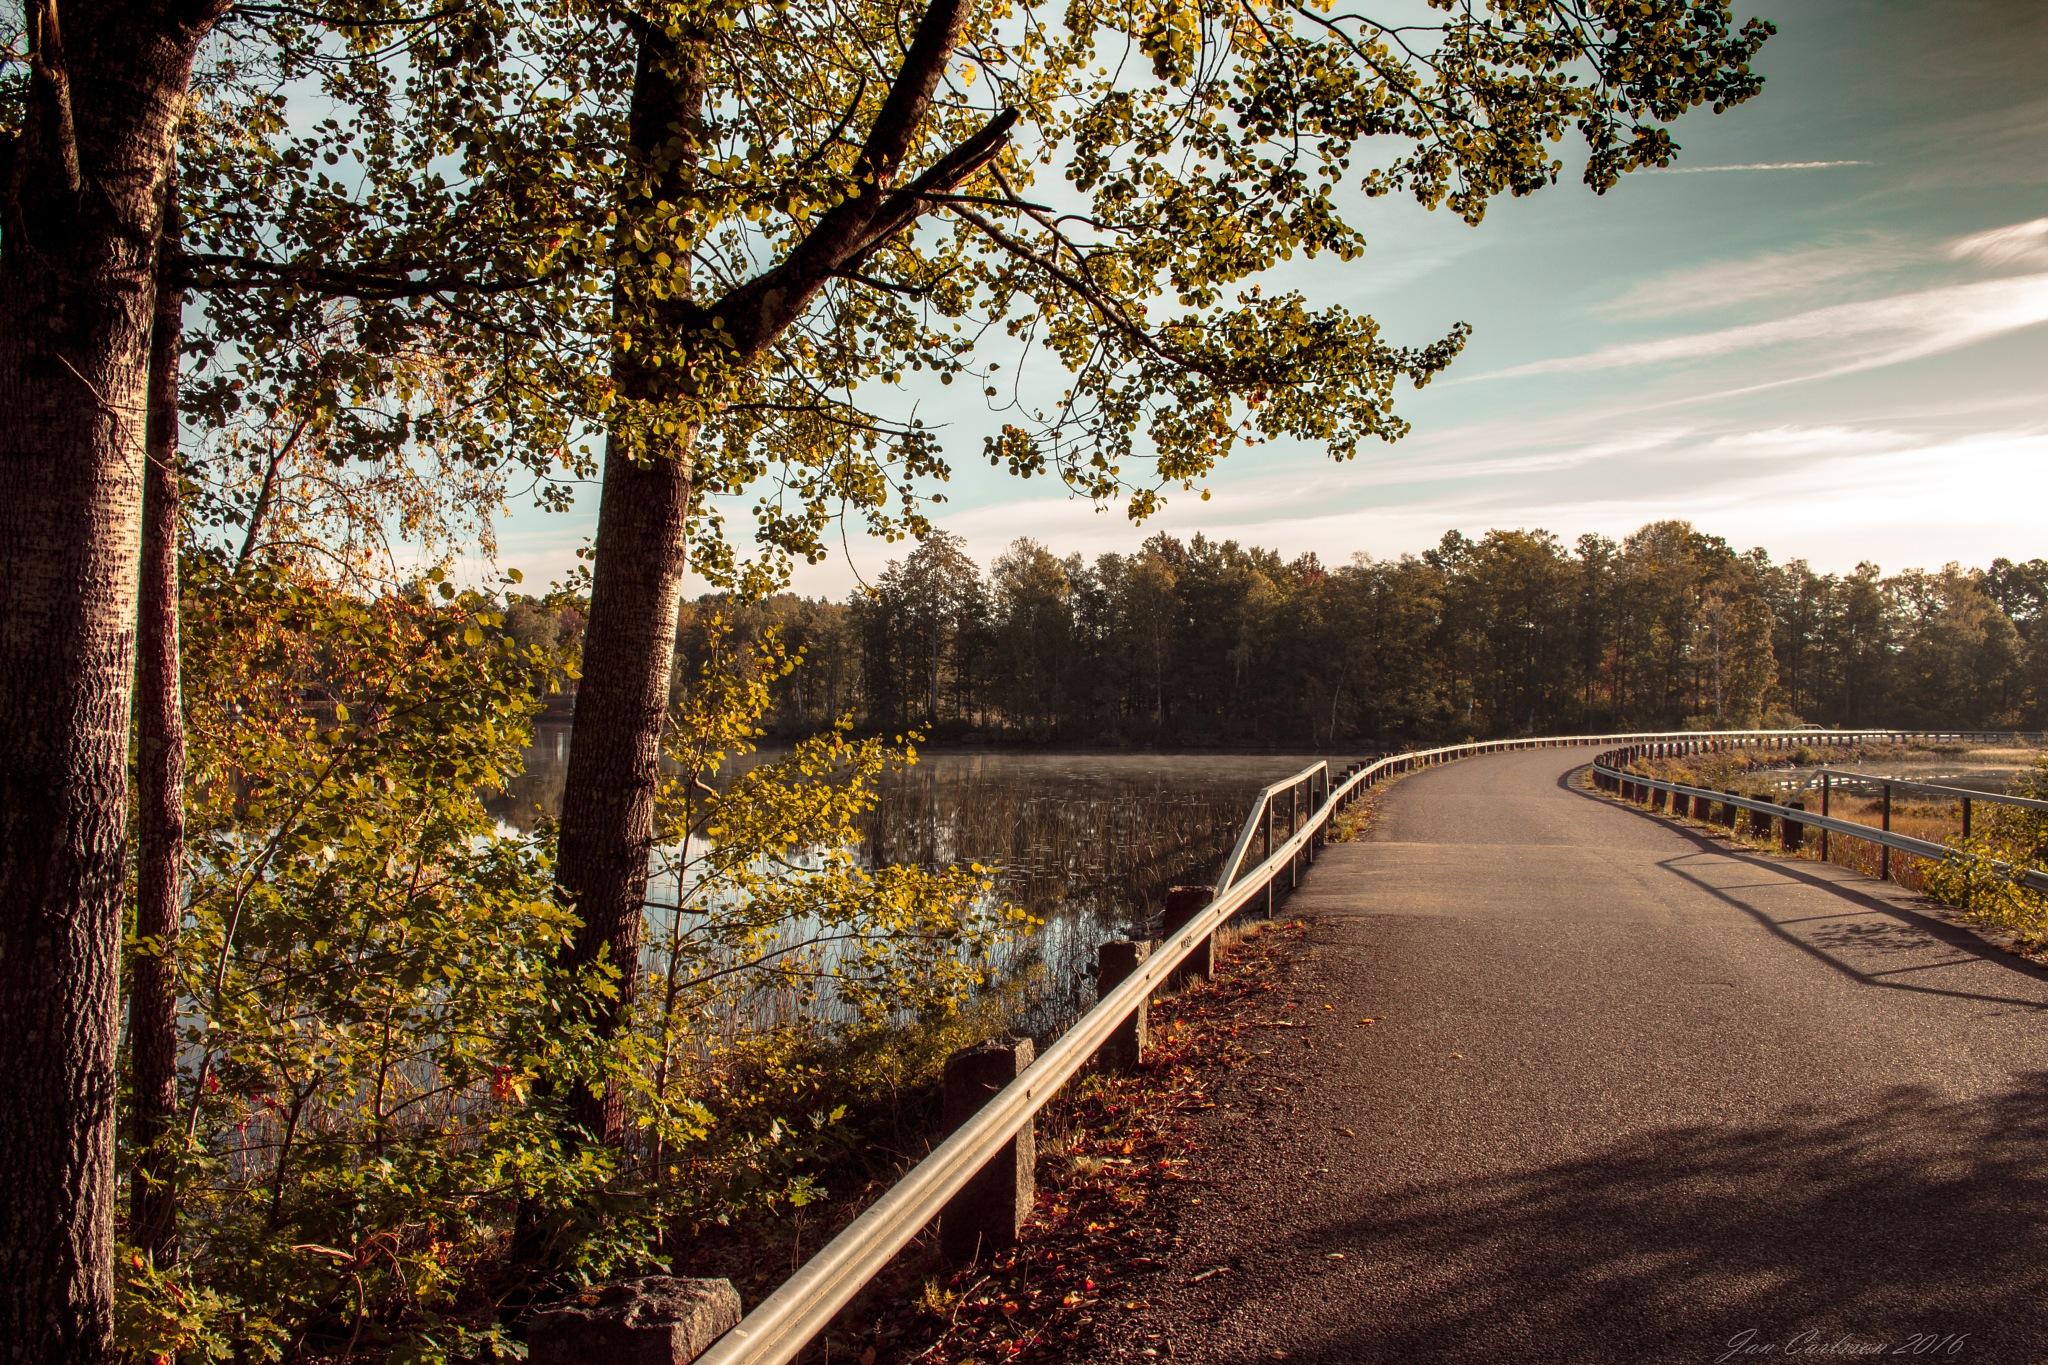 Morning at the Lake 1 by carljan w carlsson